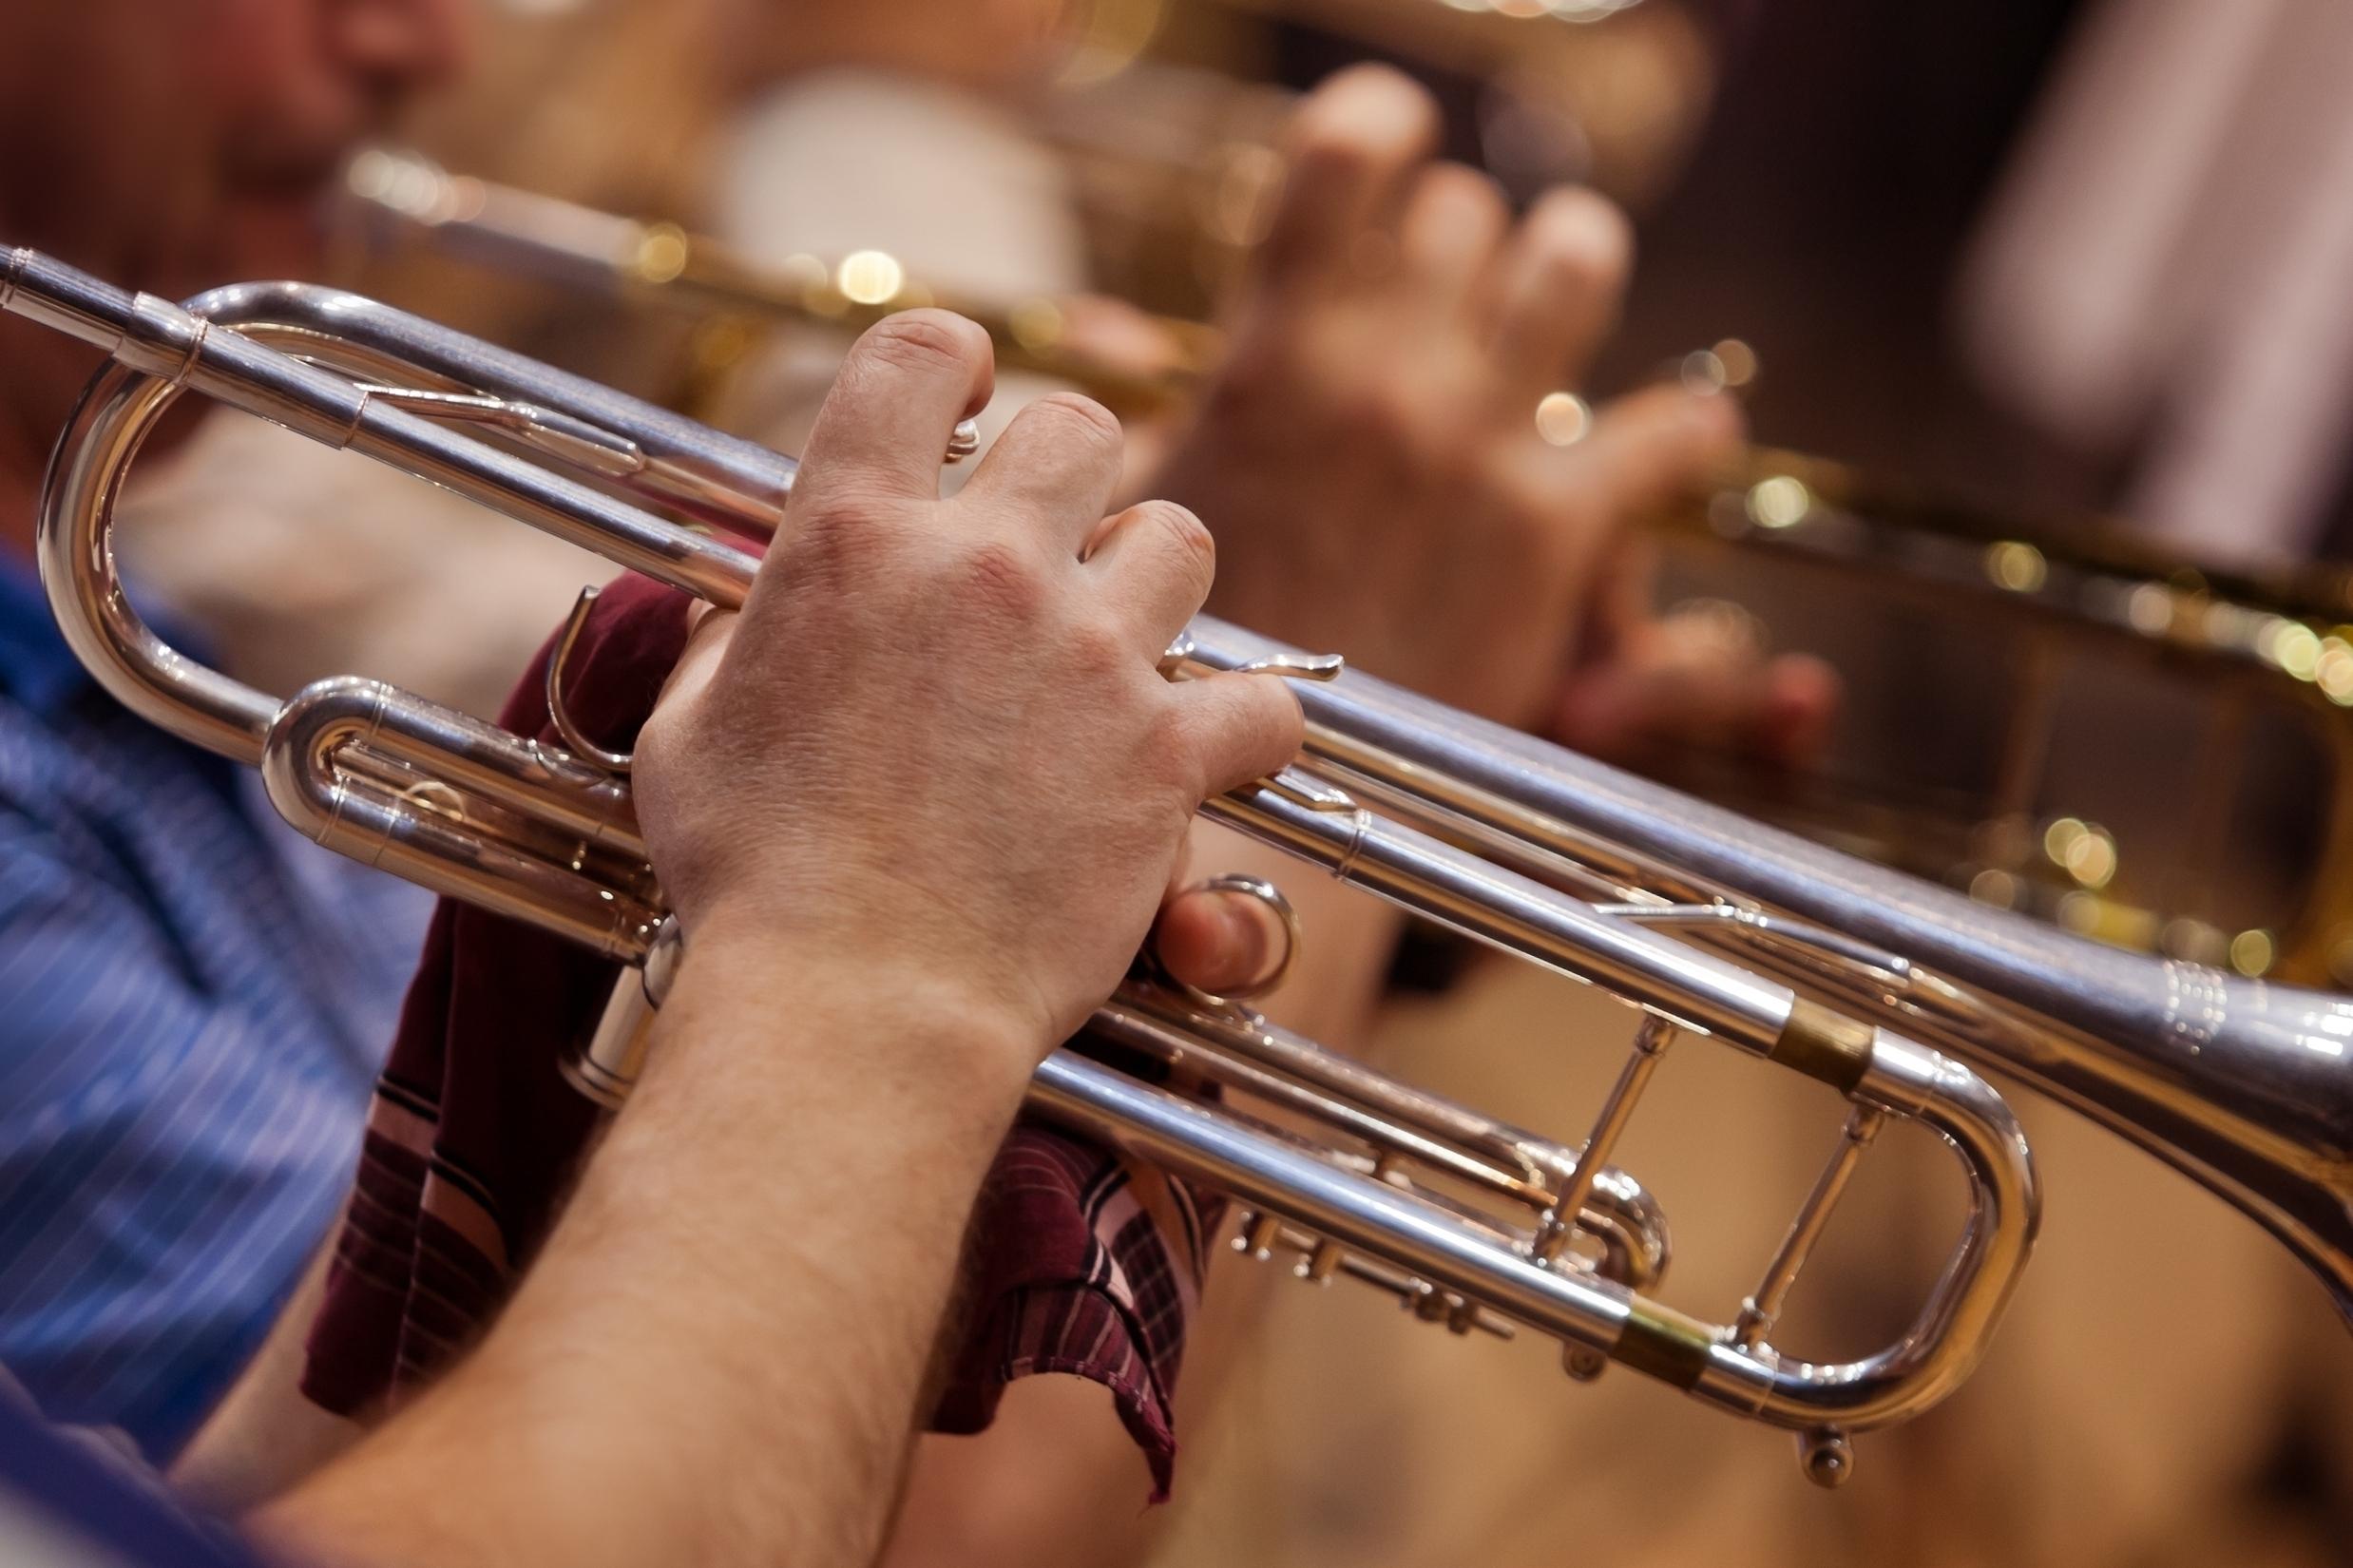 c2a3bd69e7db4ceb8543_Trumpet.jpg